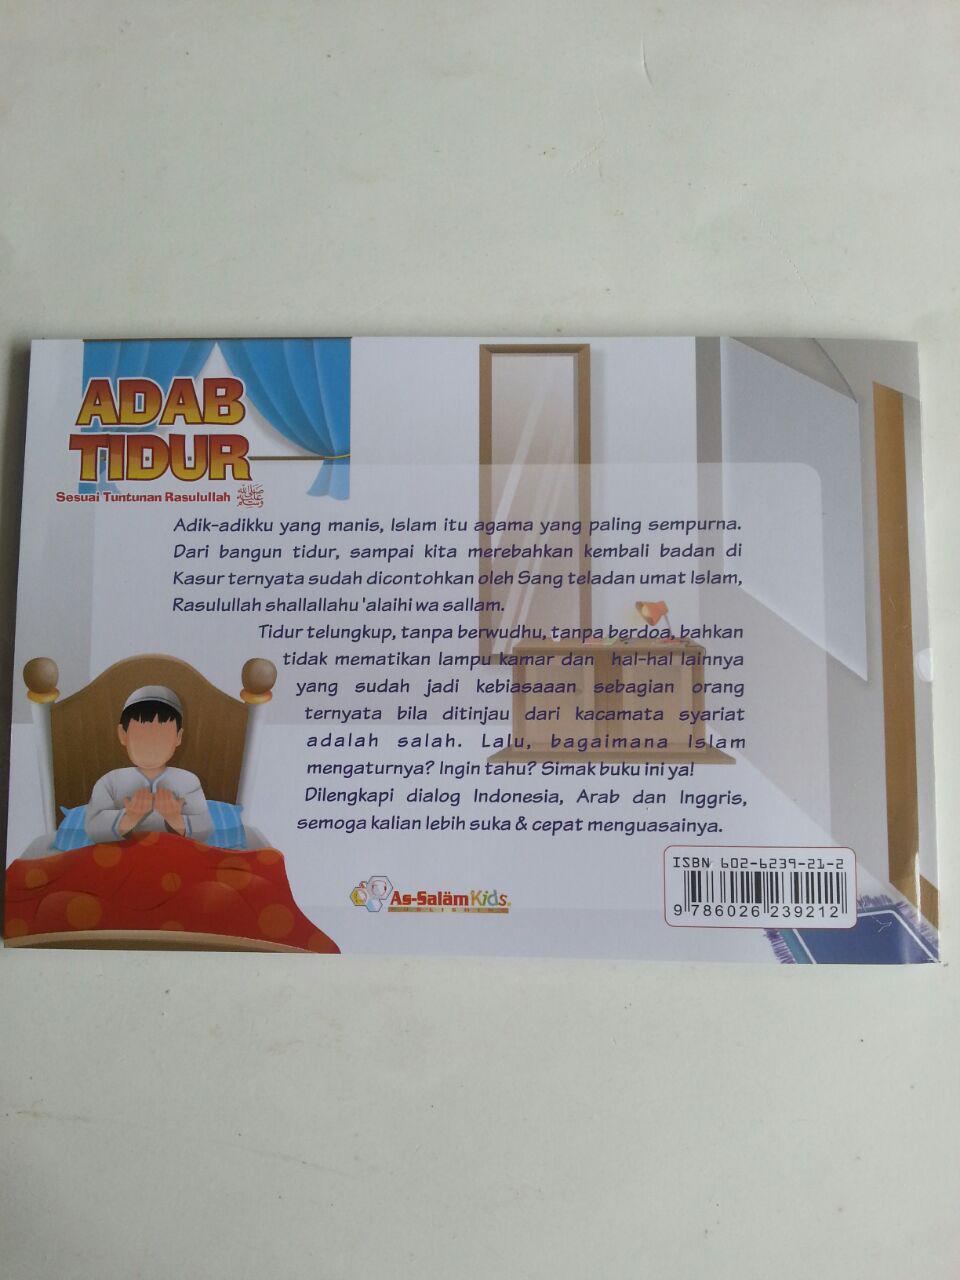 Buku Anak Adab Tidur Sesuai Tuntunan Rasulullah cover